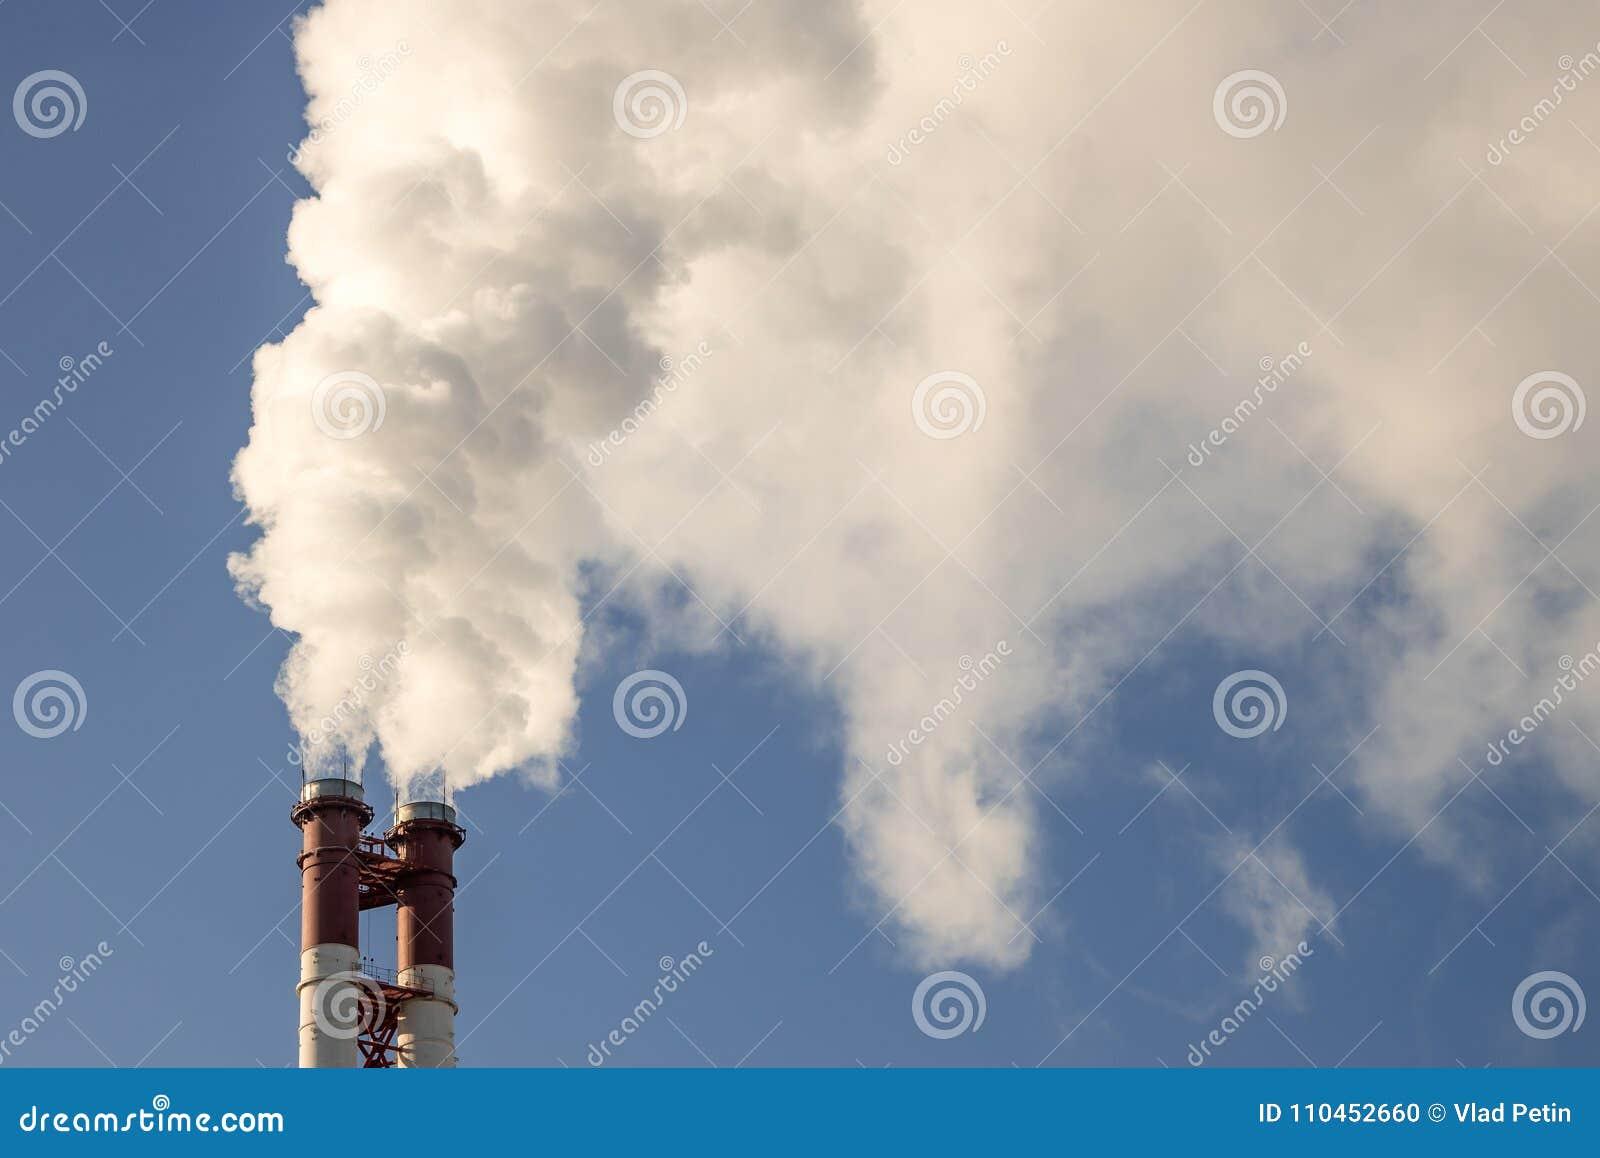 Industriell fabriksrörrök